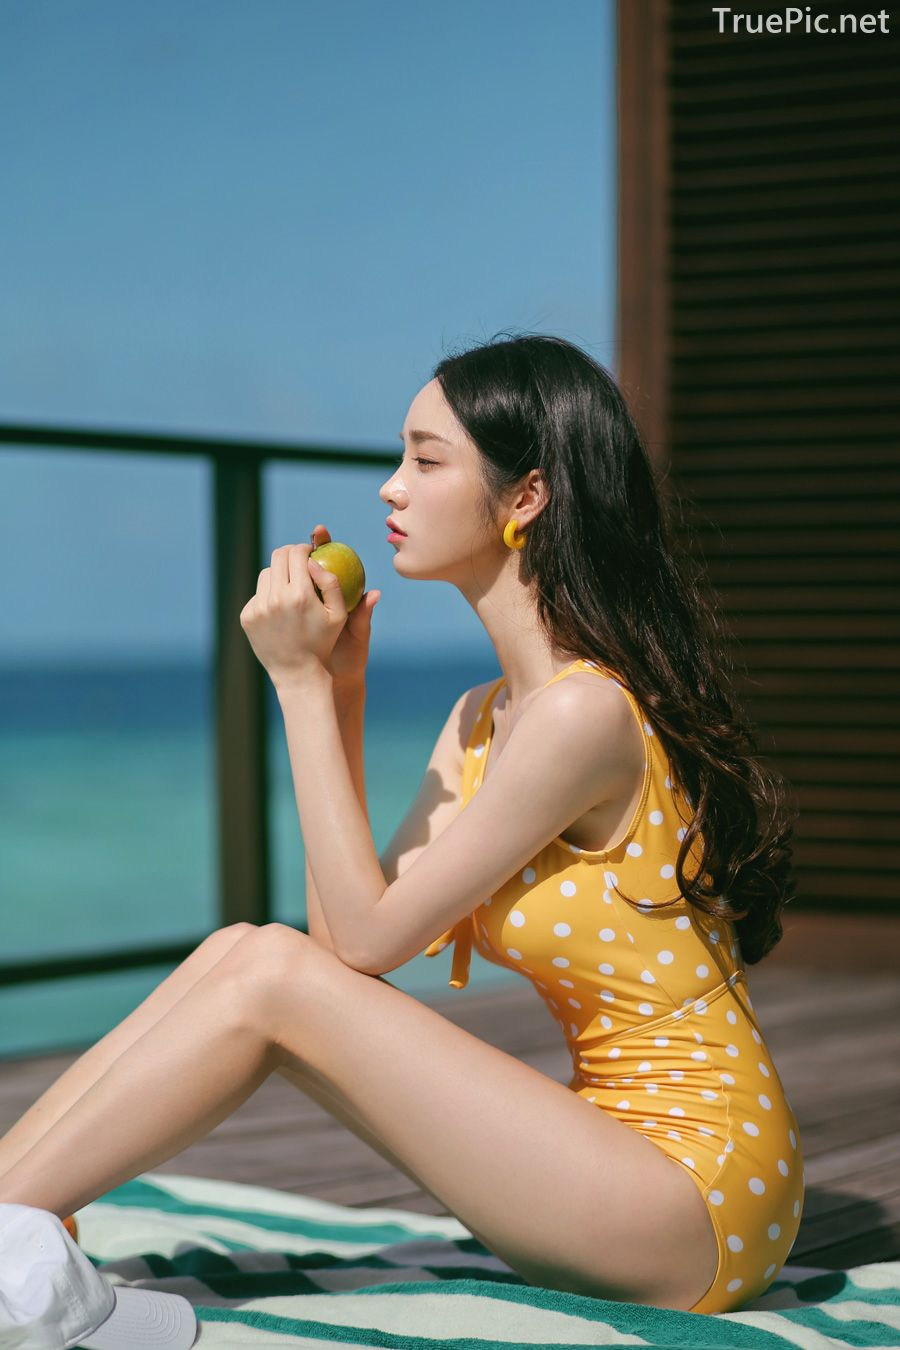 Korean fashion model Jeong Hee - Everyone once a monokini - Picture 8